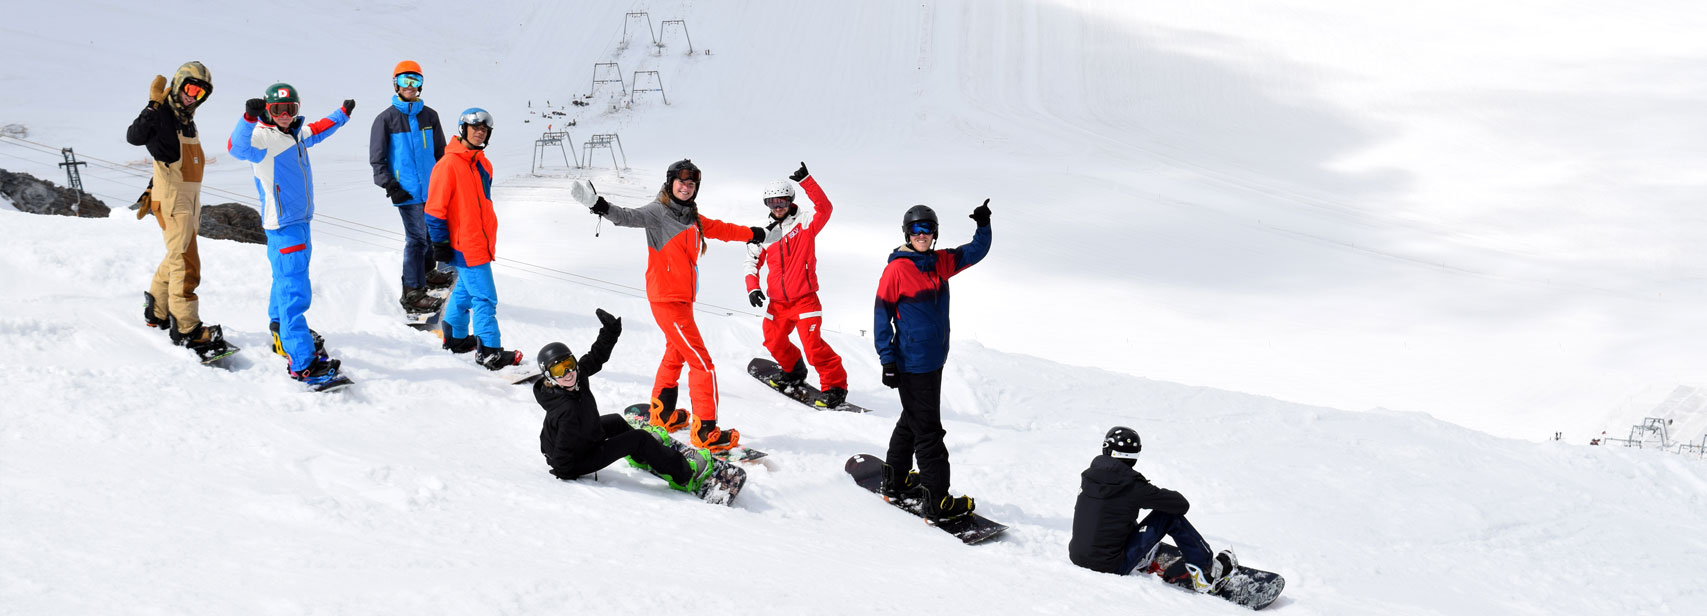 Snowboard Anwarter December 2020 Snowsports Instructor Ski Instructor And Snowboard Instructor Courses